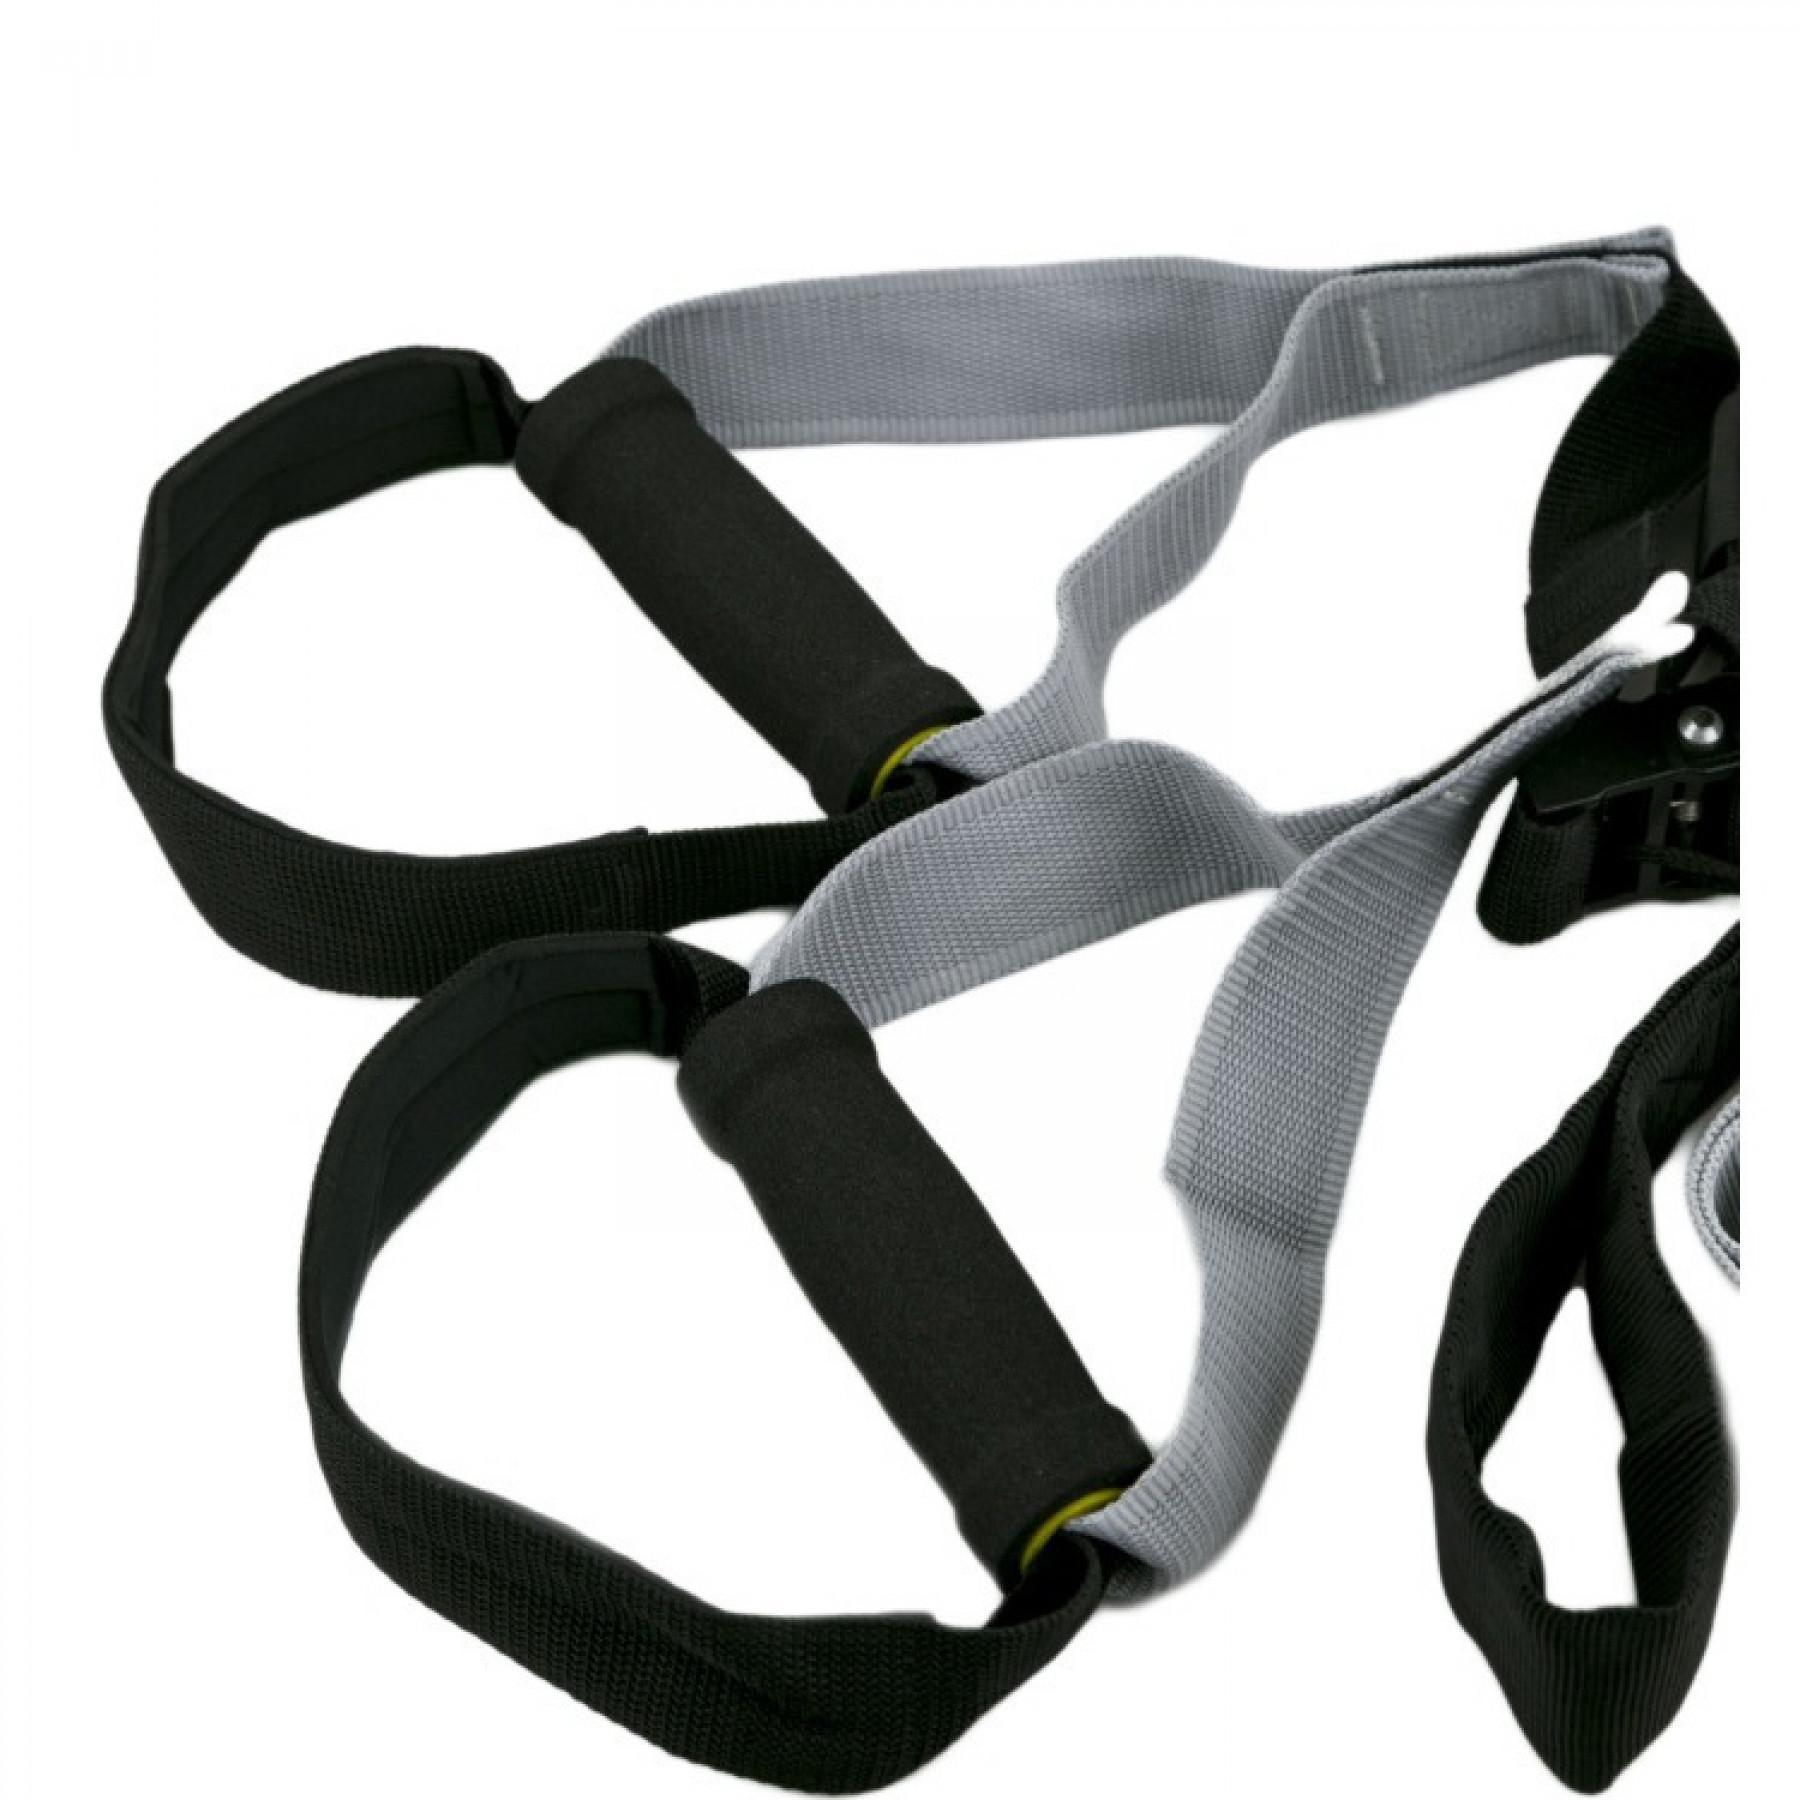 Strengthening strap - Suspension - Power Shot muscle strengthening